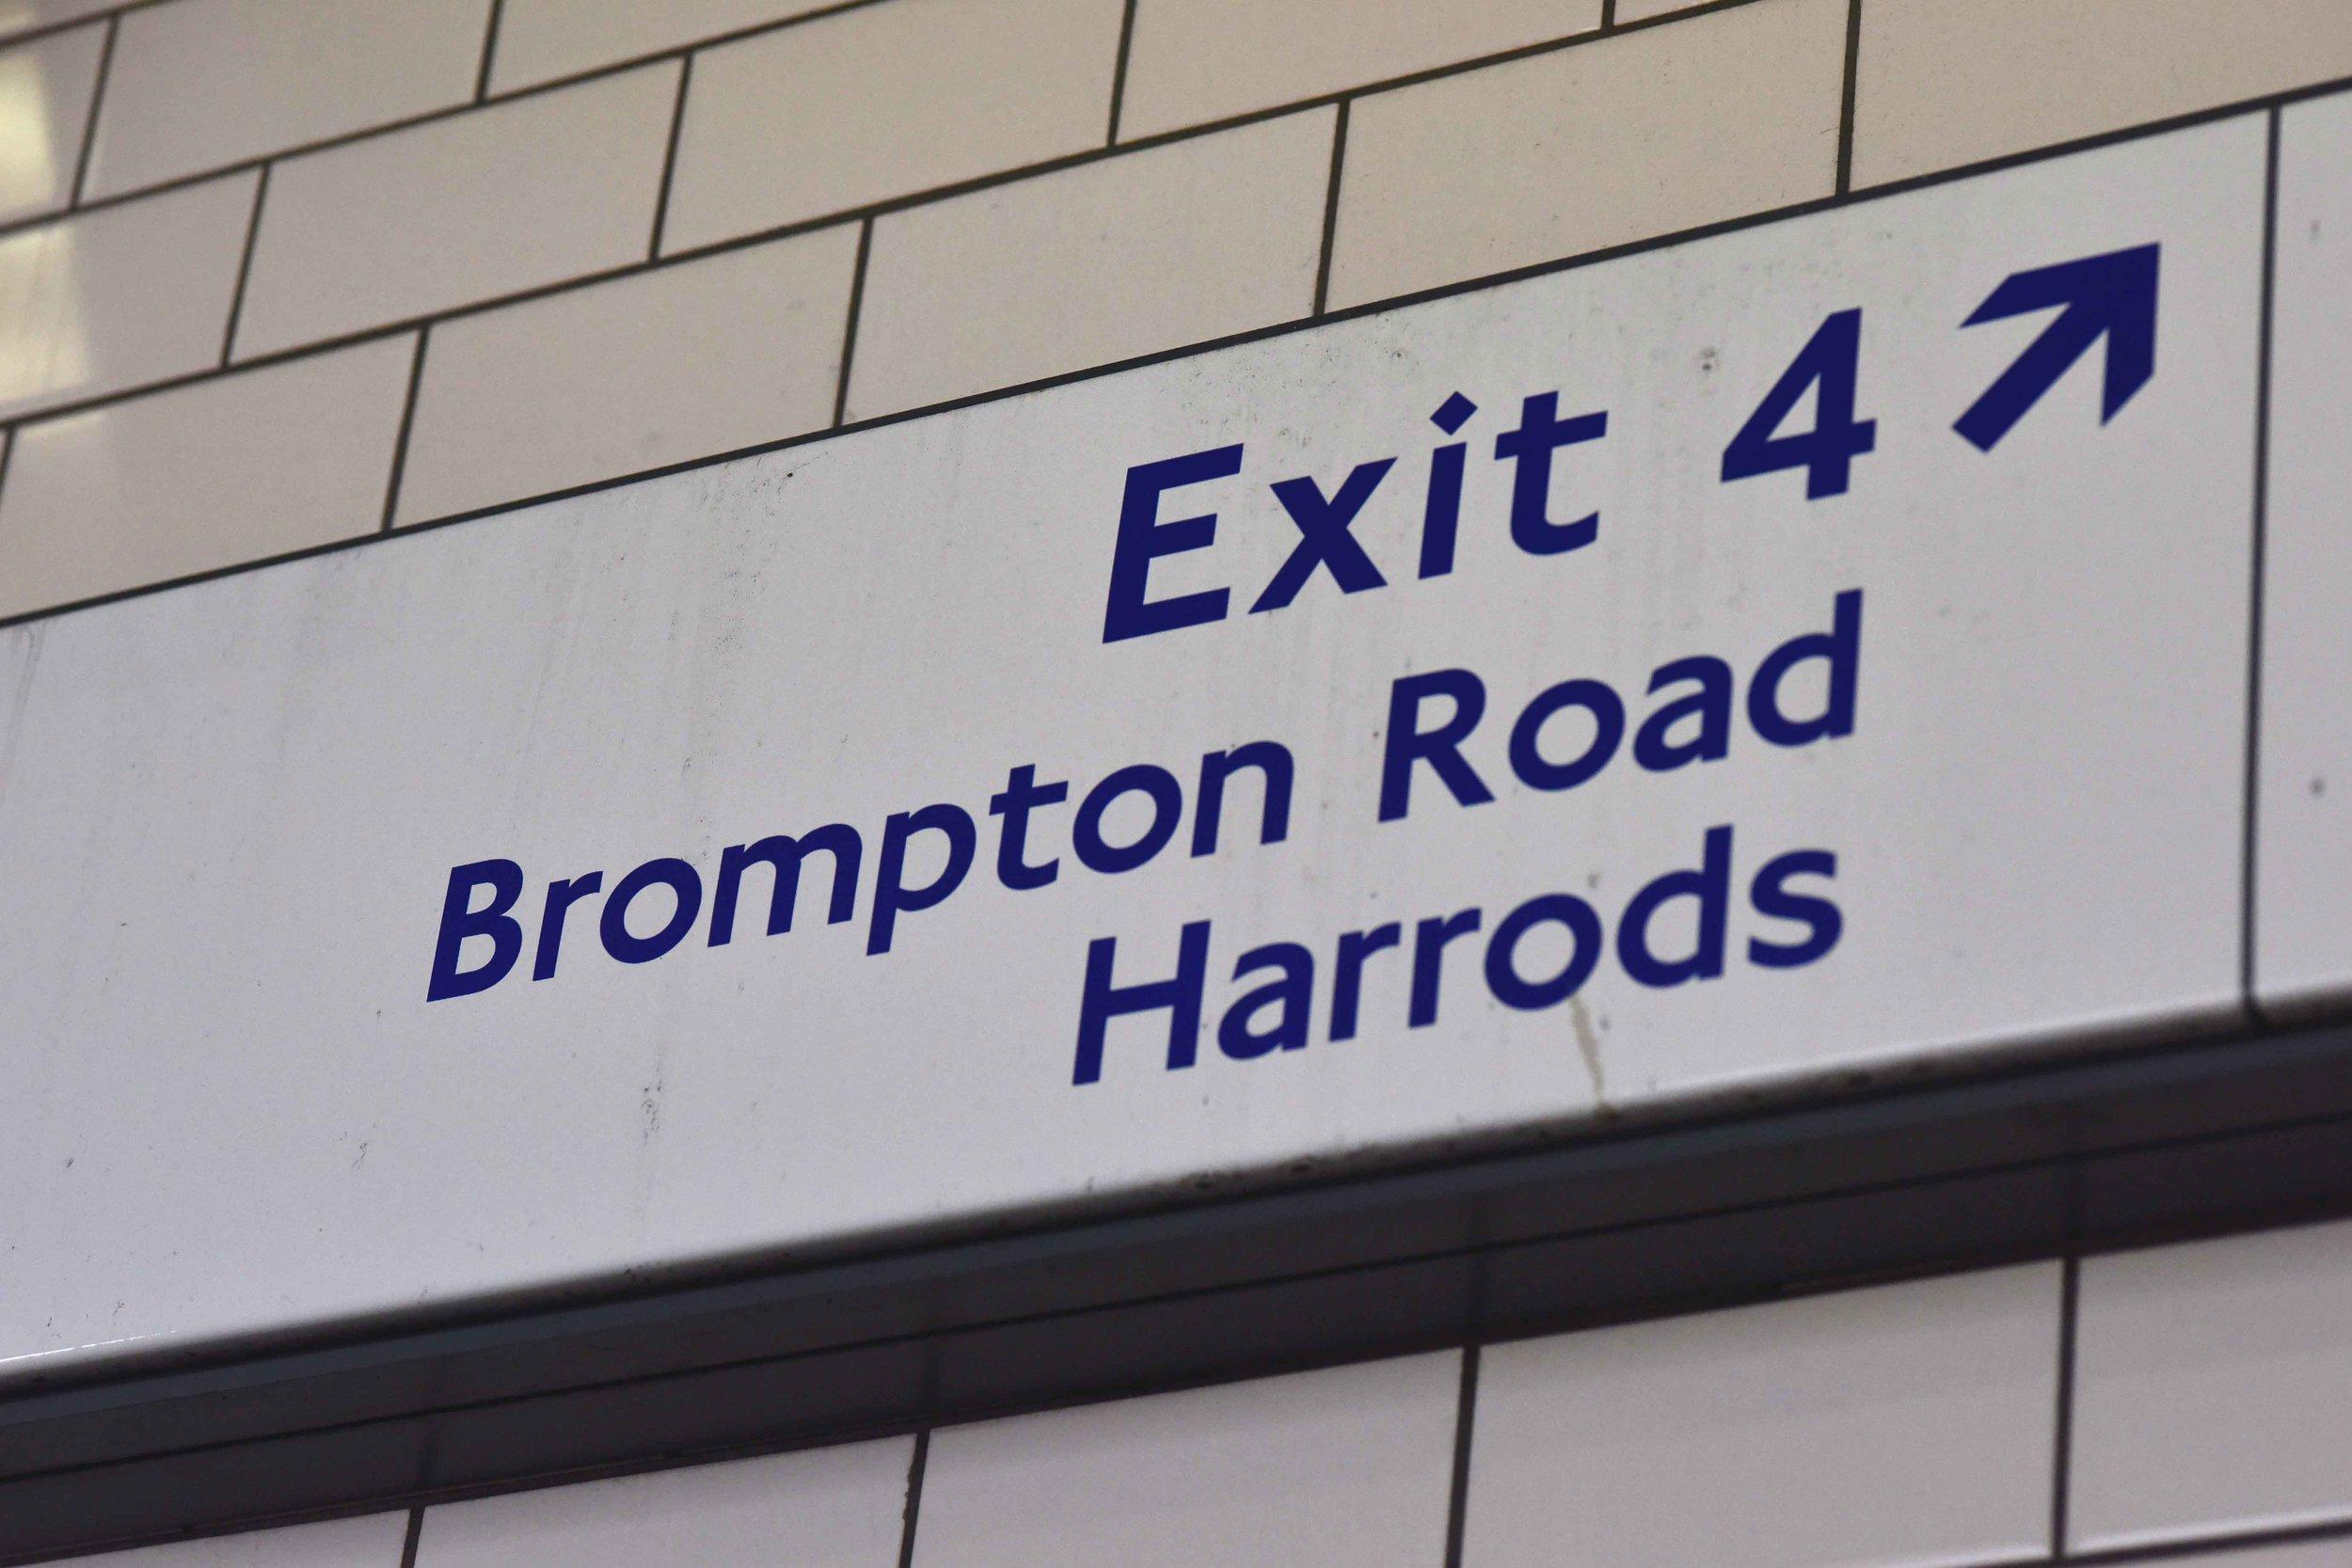 Underground,Harrods, London. Image©thingstodot.com